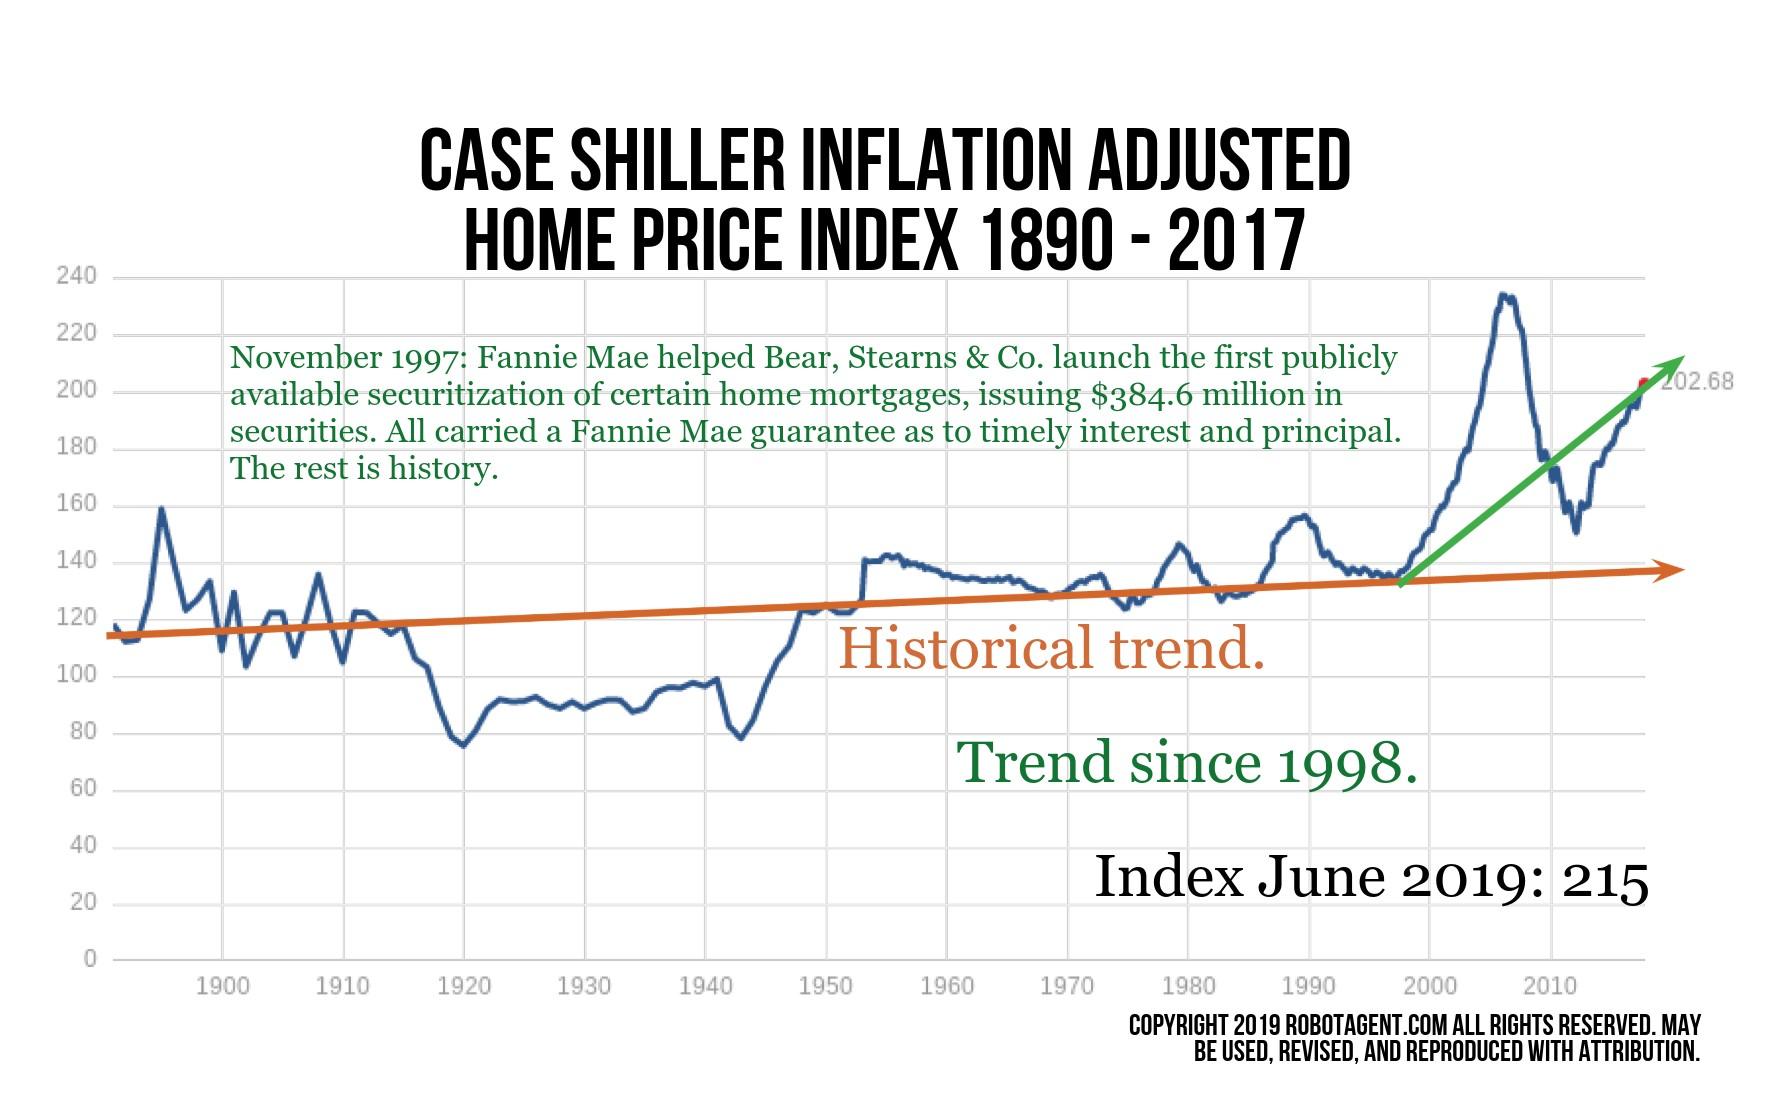 infl-adj-housing-price-index-history2.jpg